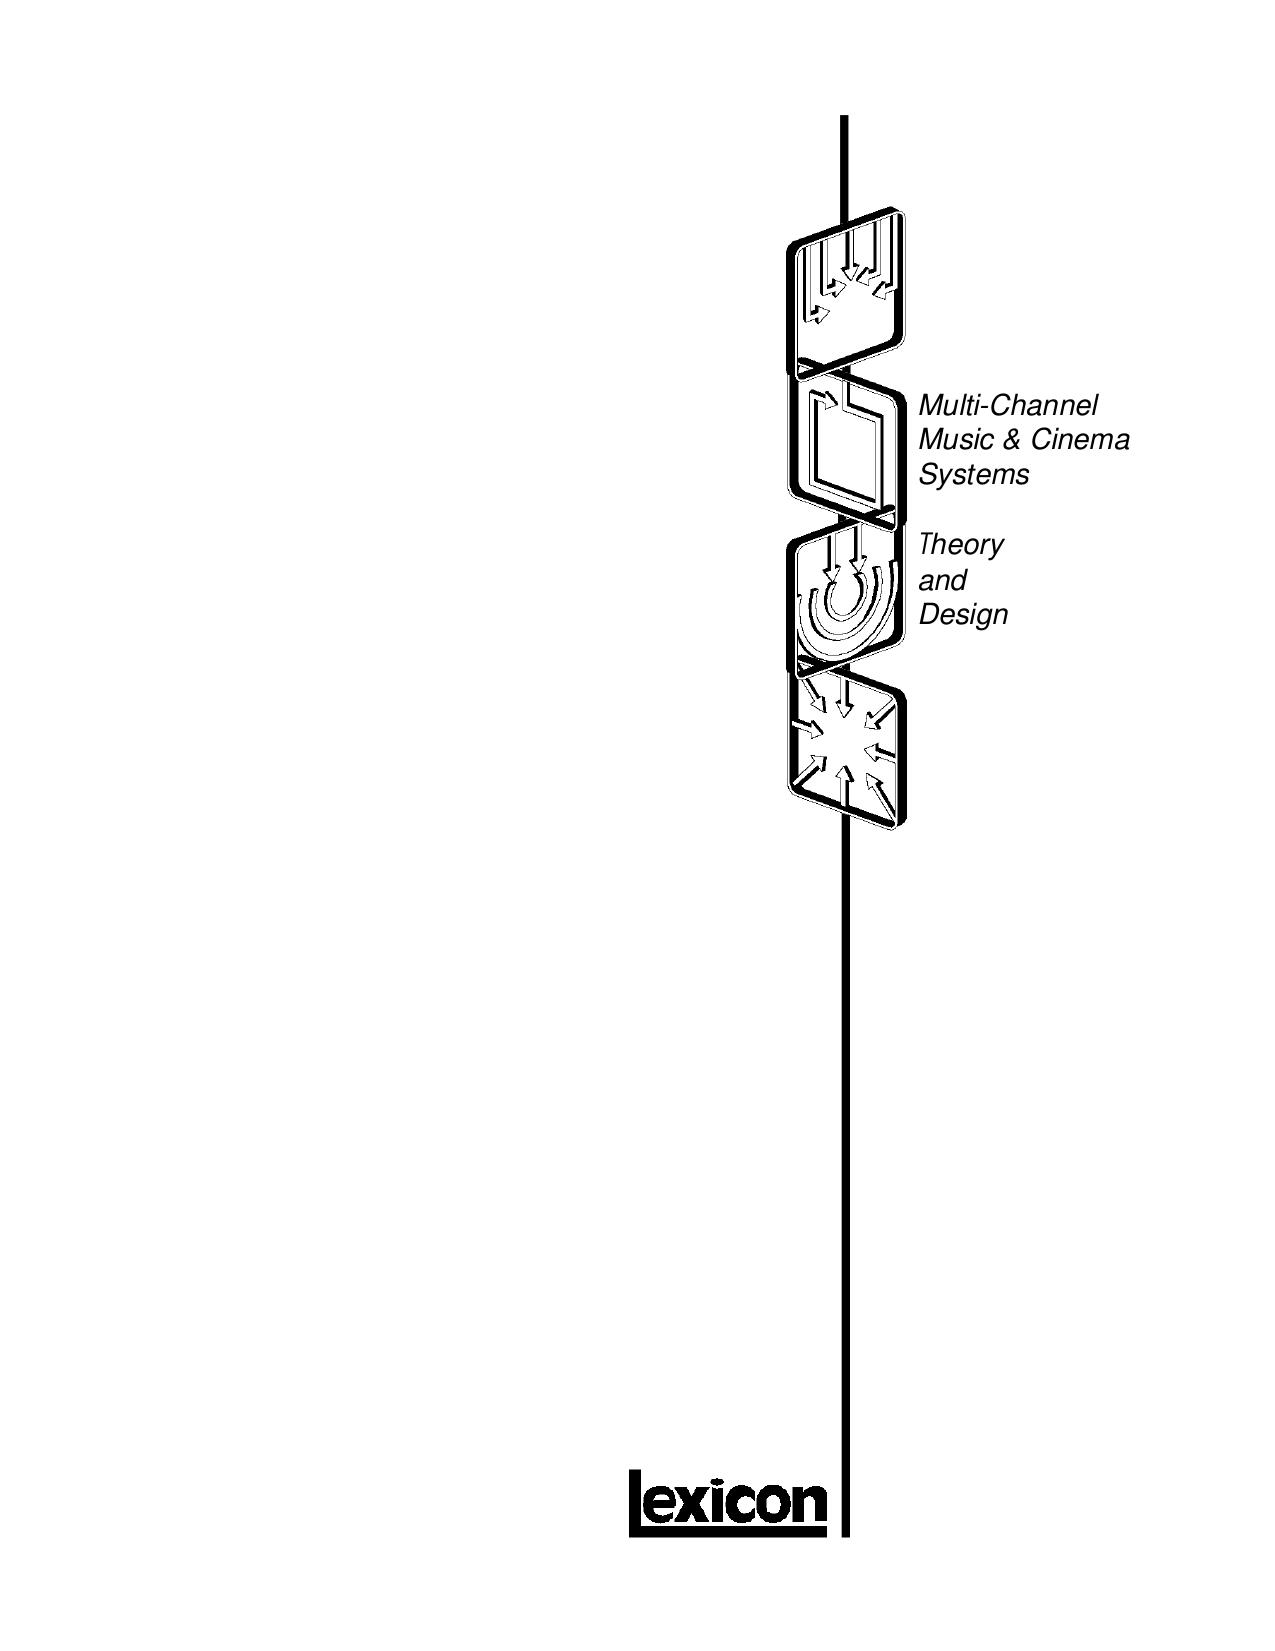 pdf for Lexicon Receiver MC-1 manual